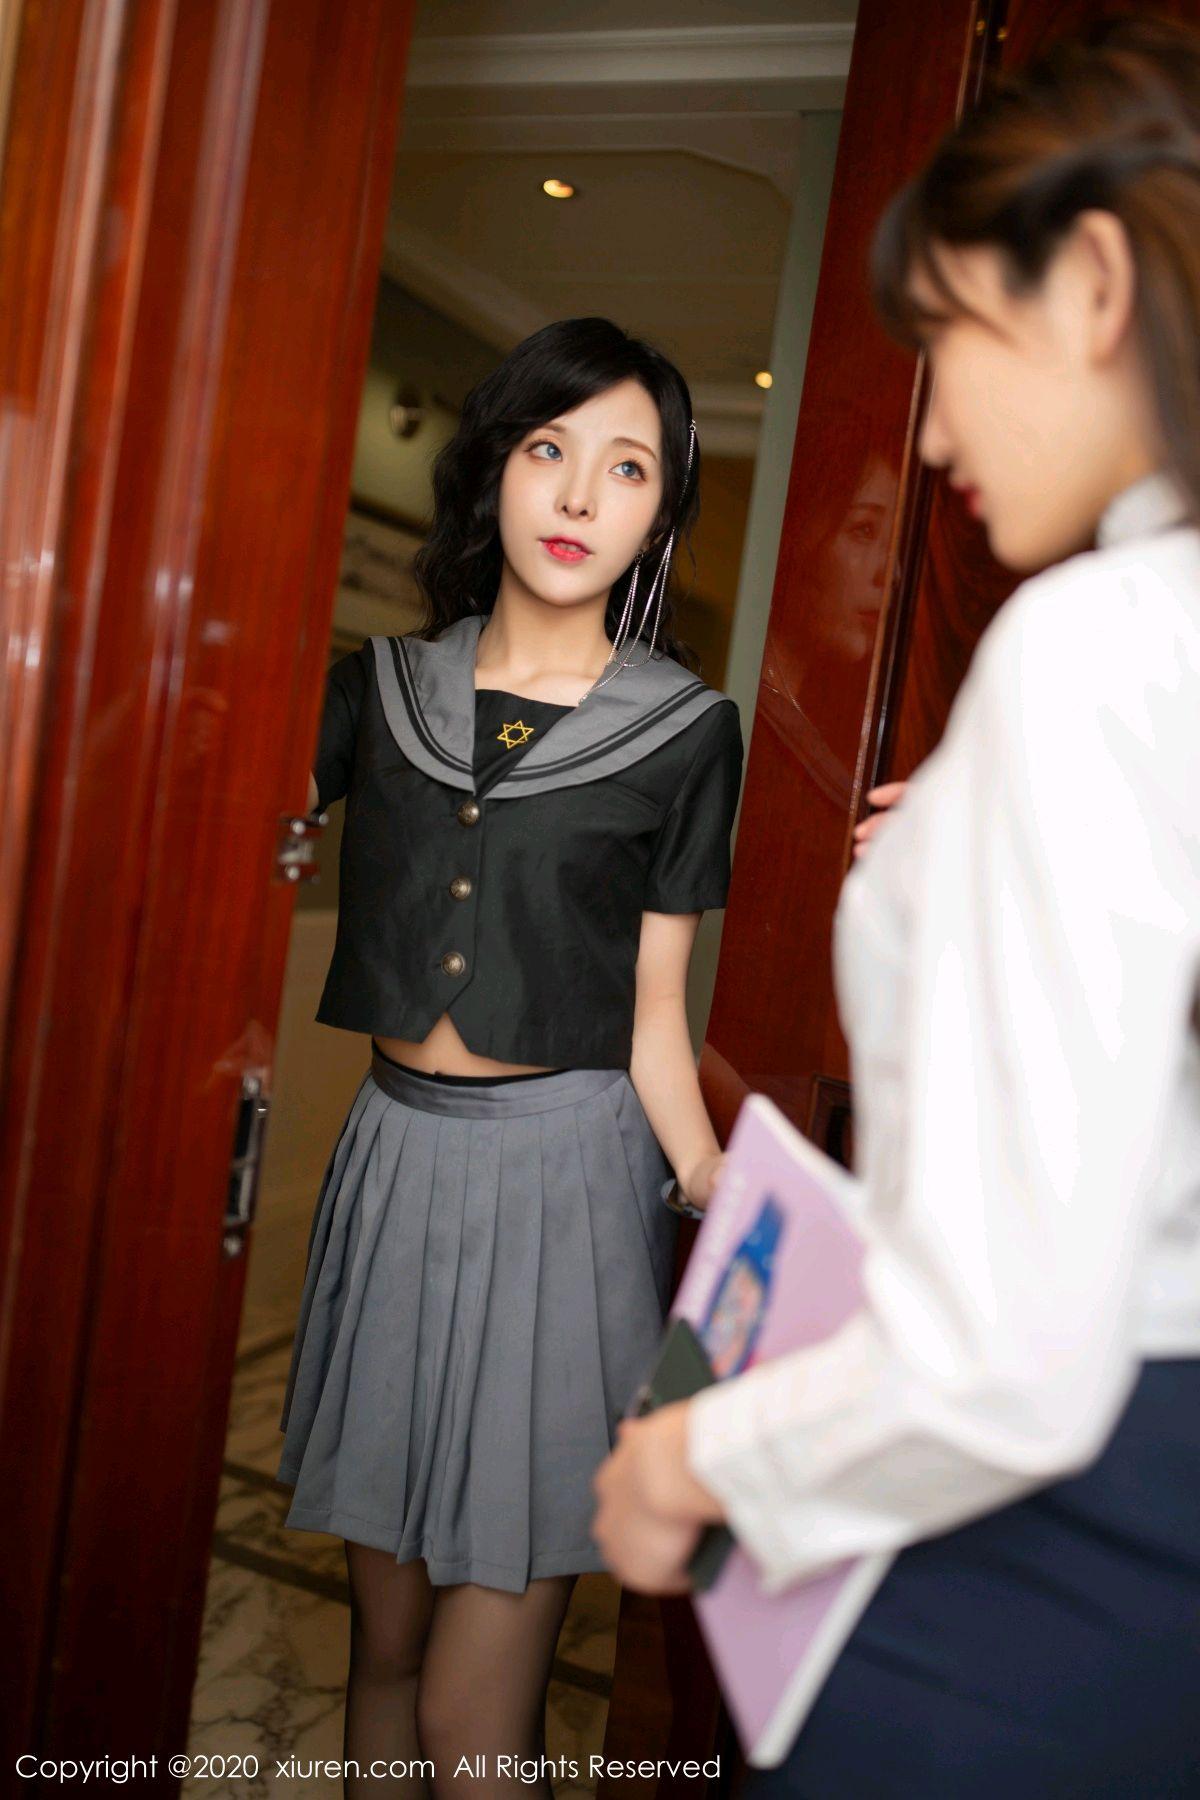 [XiuRen] Vol.2626 Secrets in mobile phones 3P, Chen Xiao Miao, Lu Xuan Xuan, School Uniform, Sisters, Xiuren